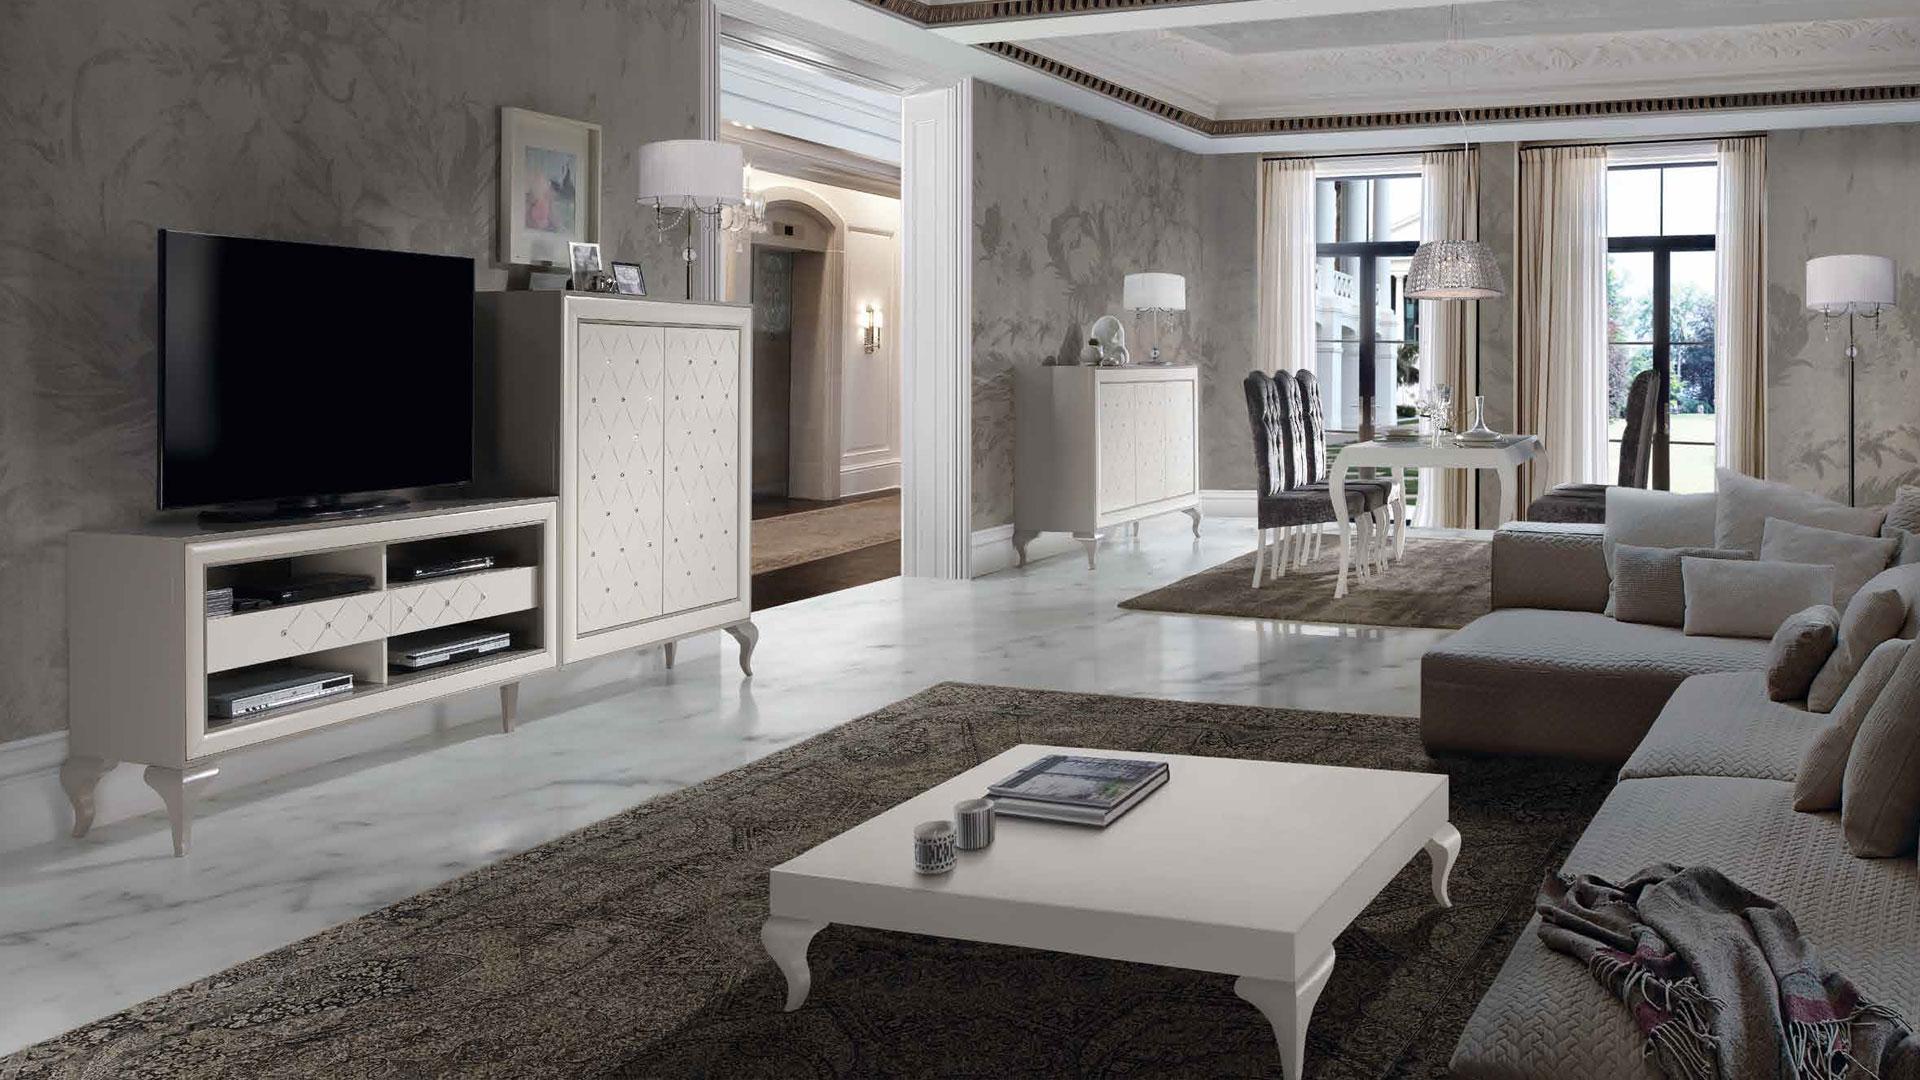 Catálogo renacent, muebles en estepona